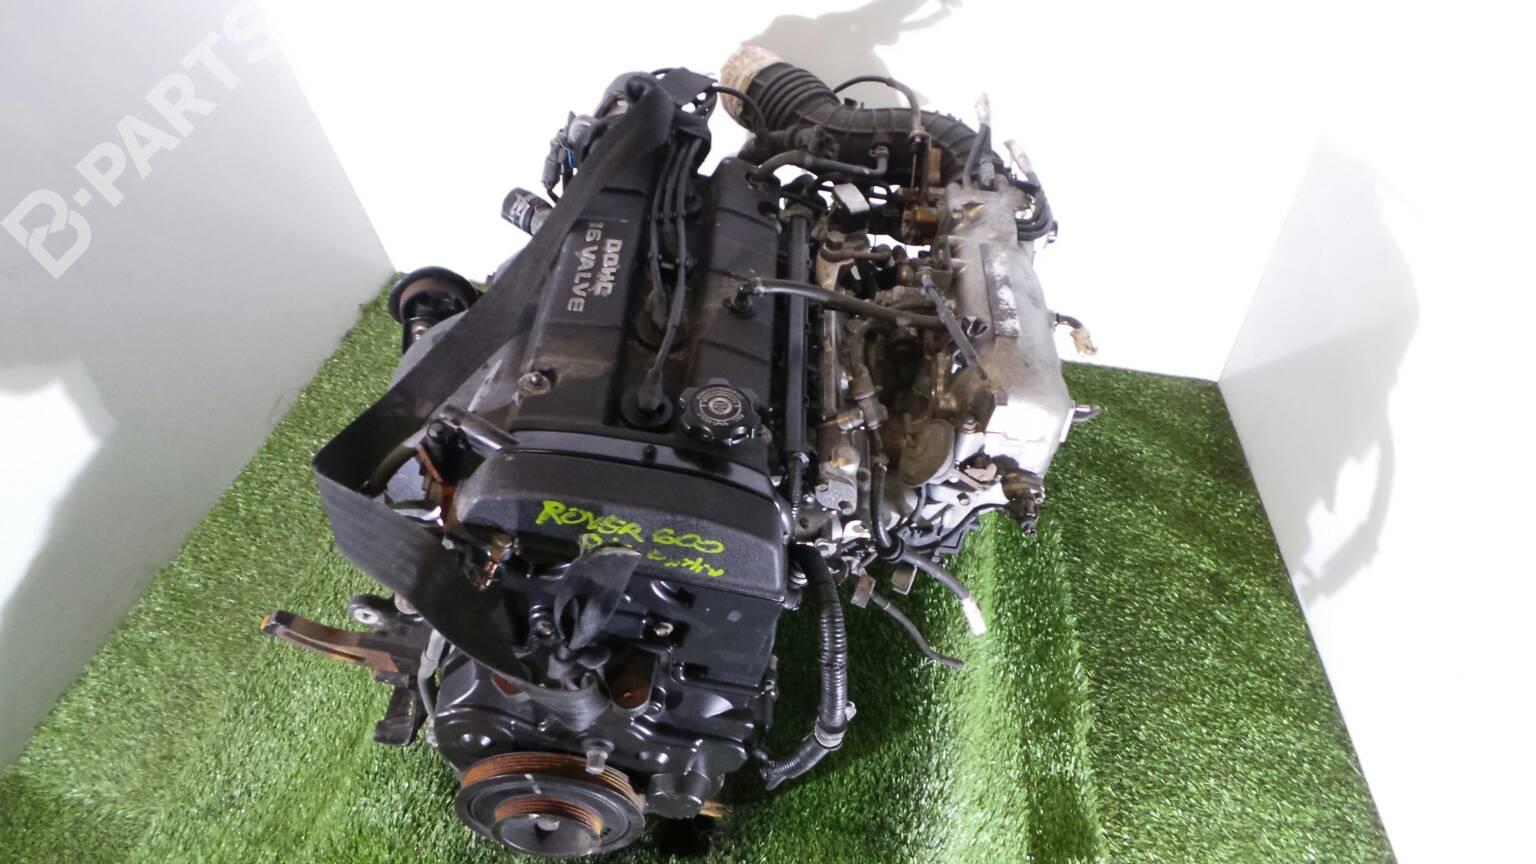 Engine Honda Prelude Iv Bb 23 I 16v Bb2 85319 1992 Complete 160hp